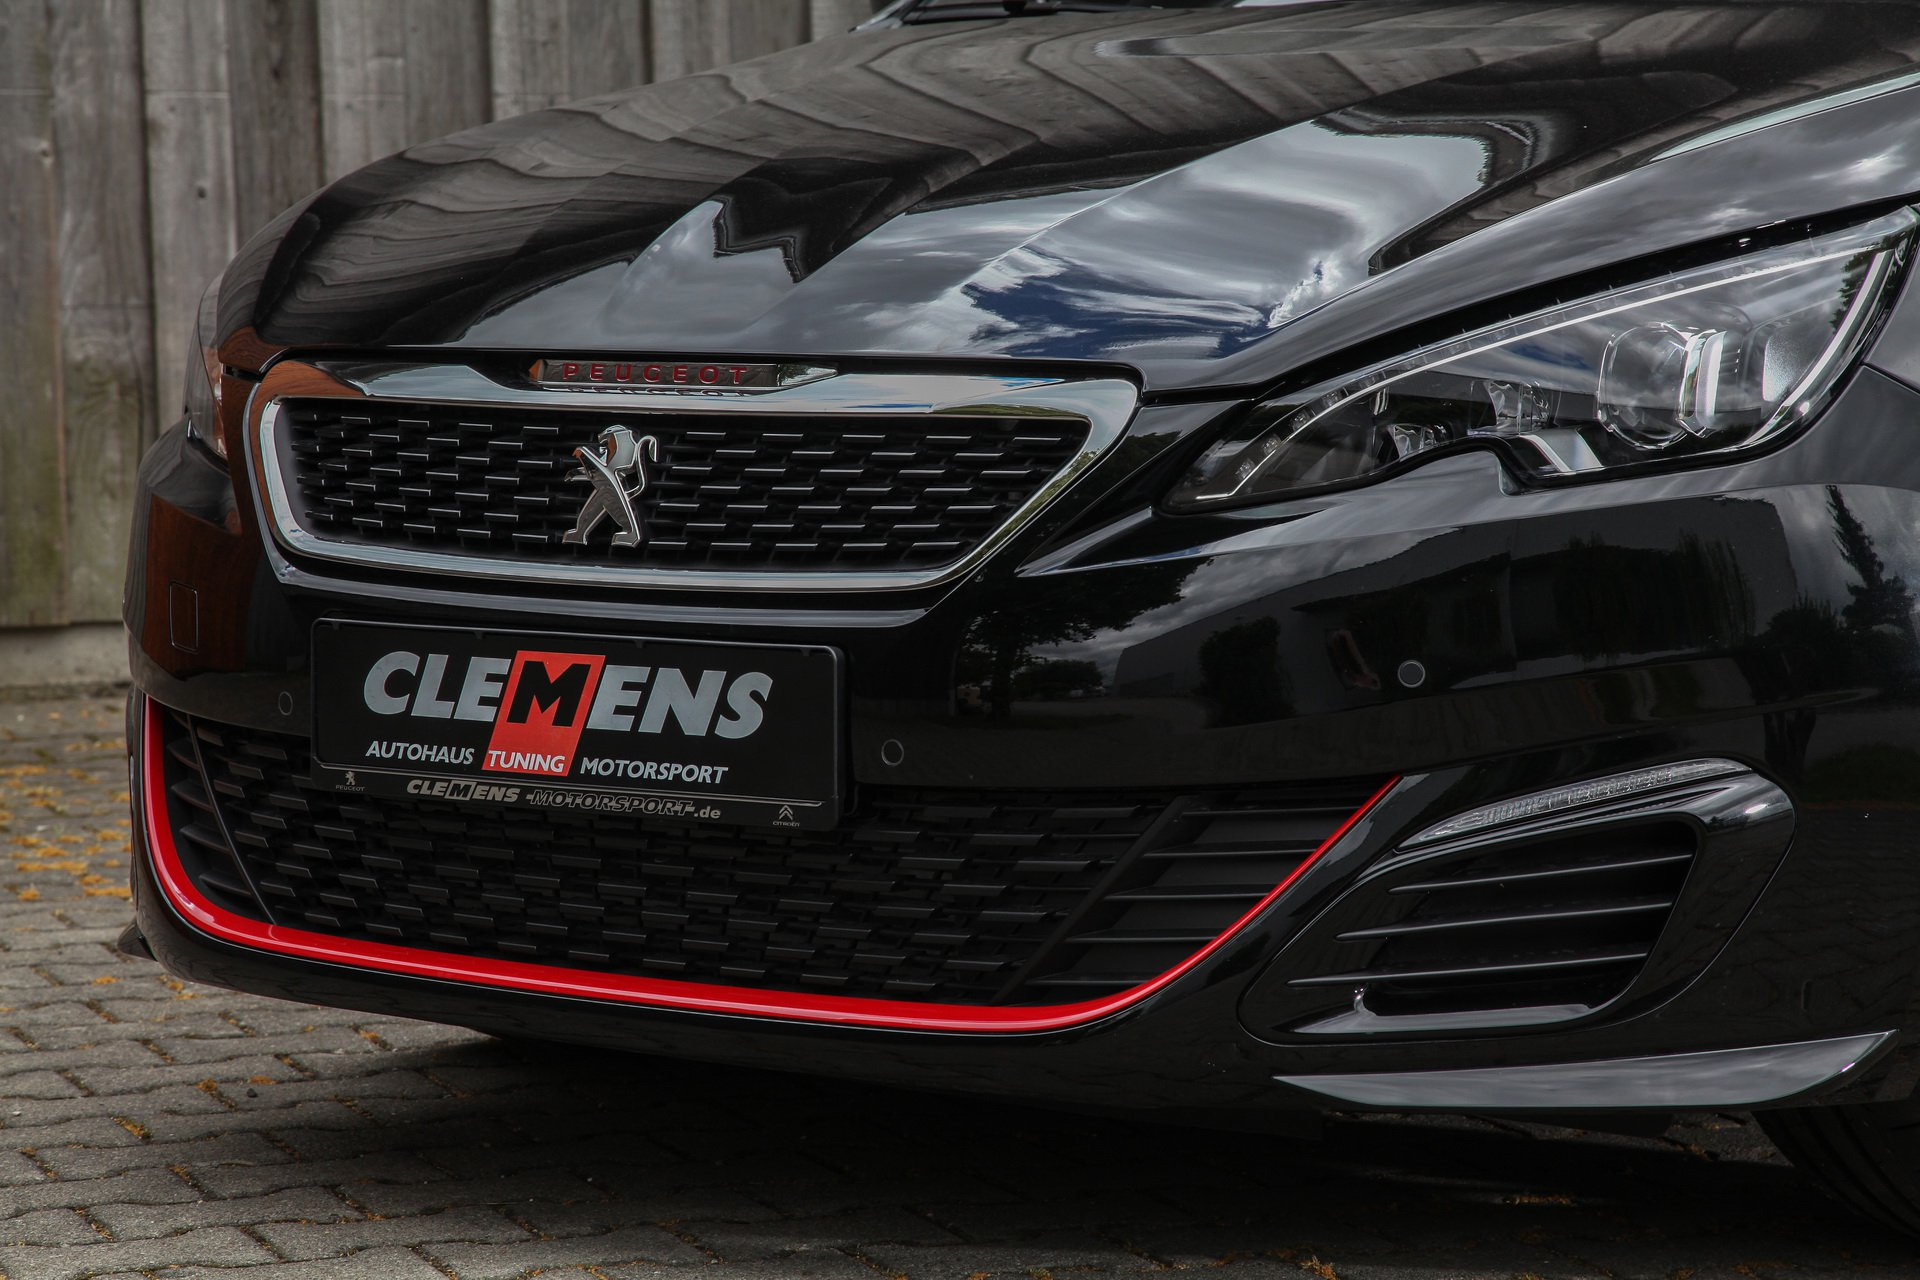 Peugeot_308_GTi_by_Clemens_Motorsport_0010